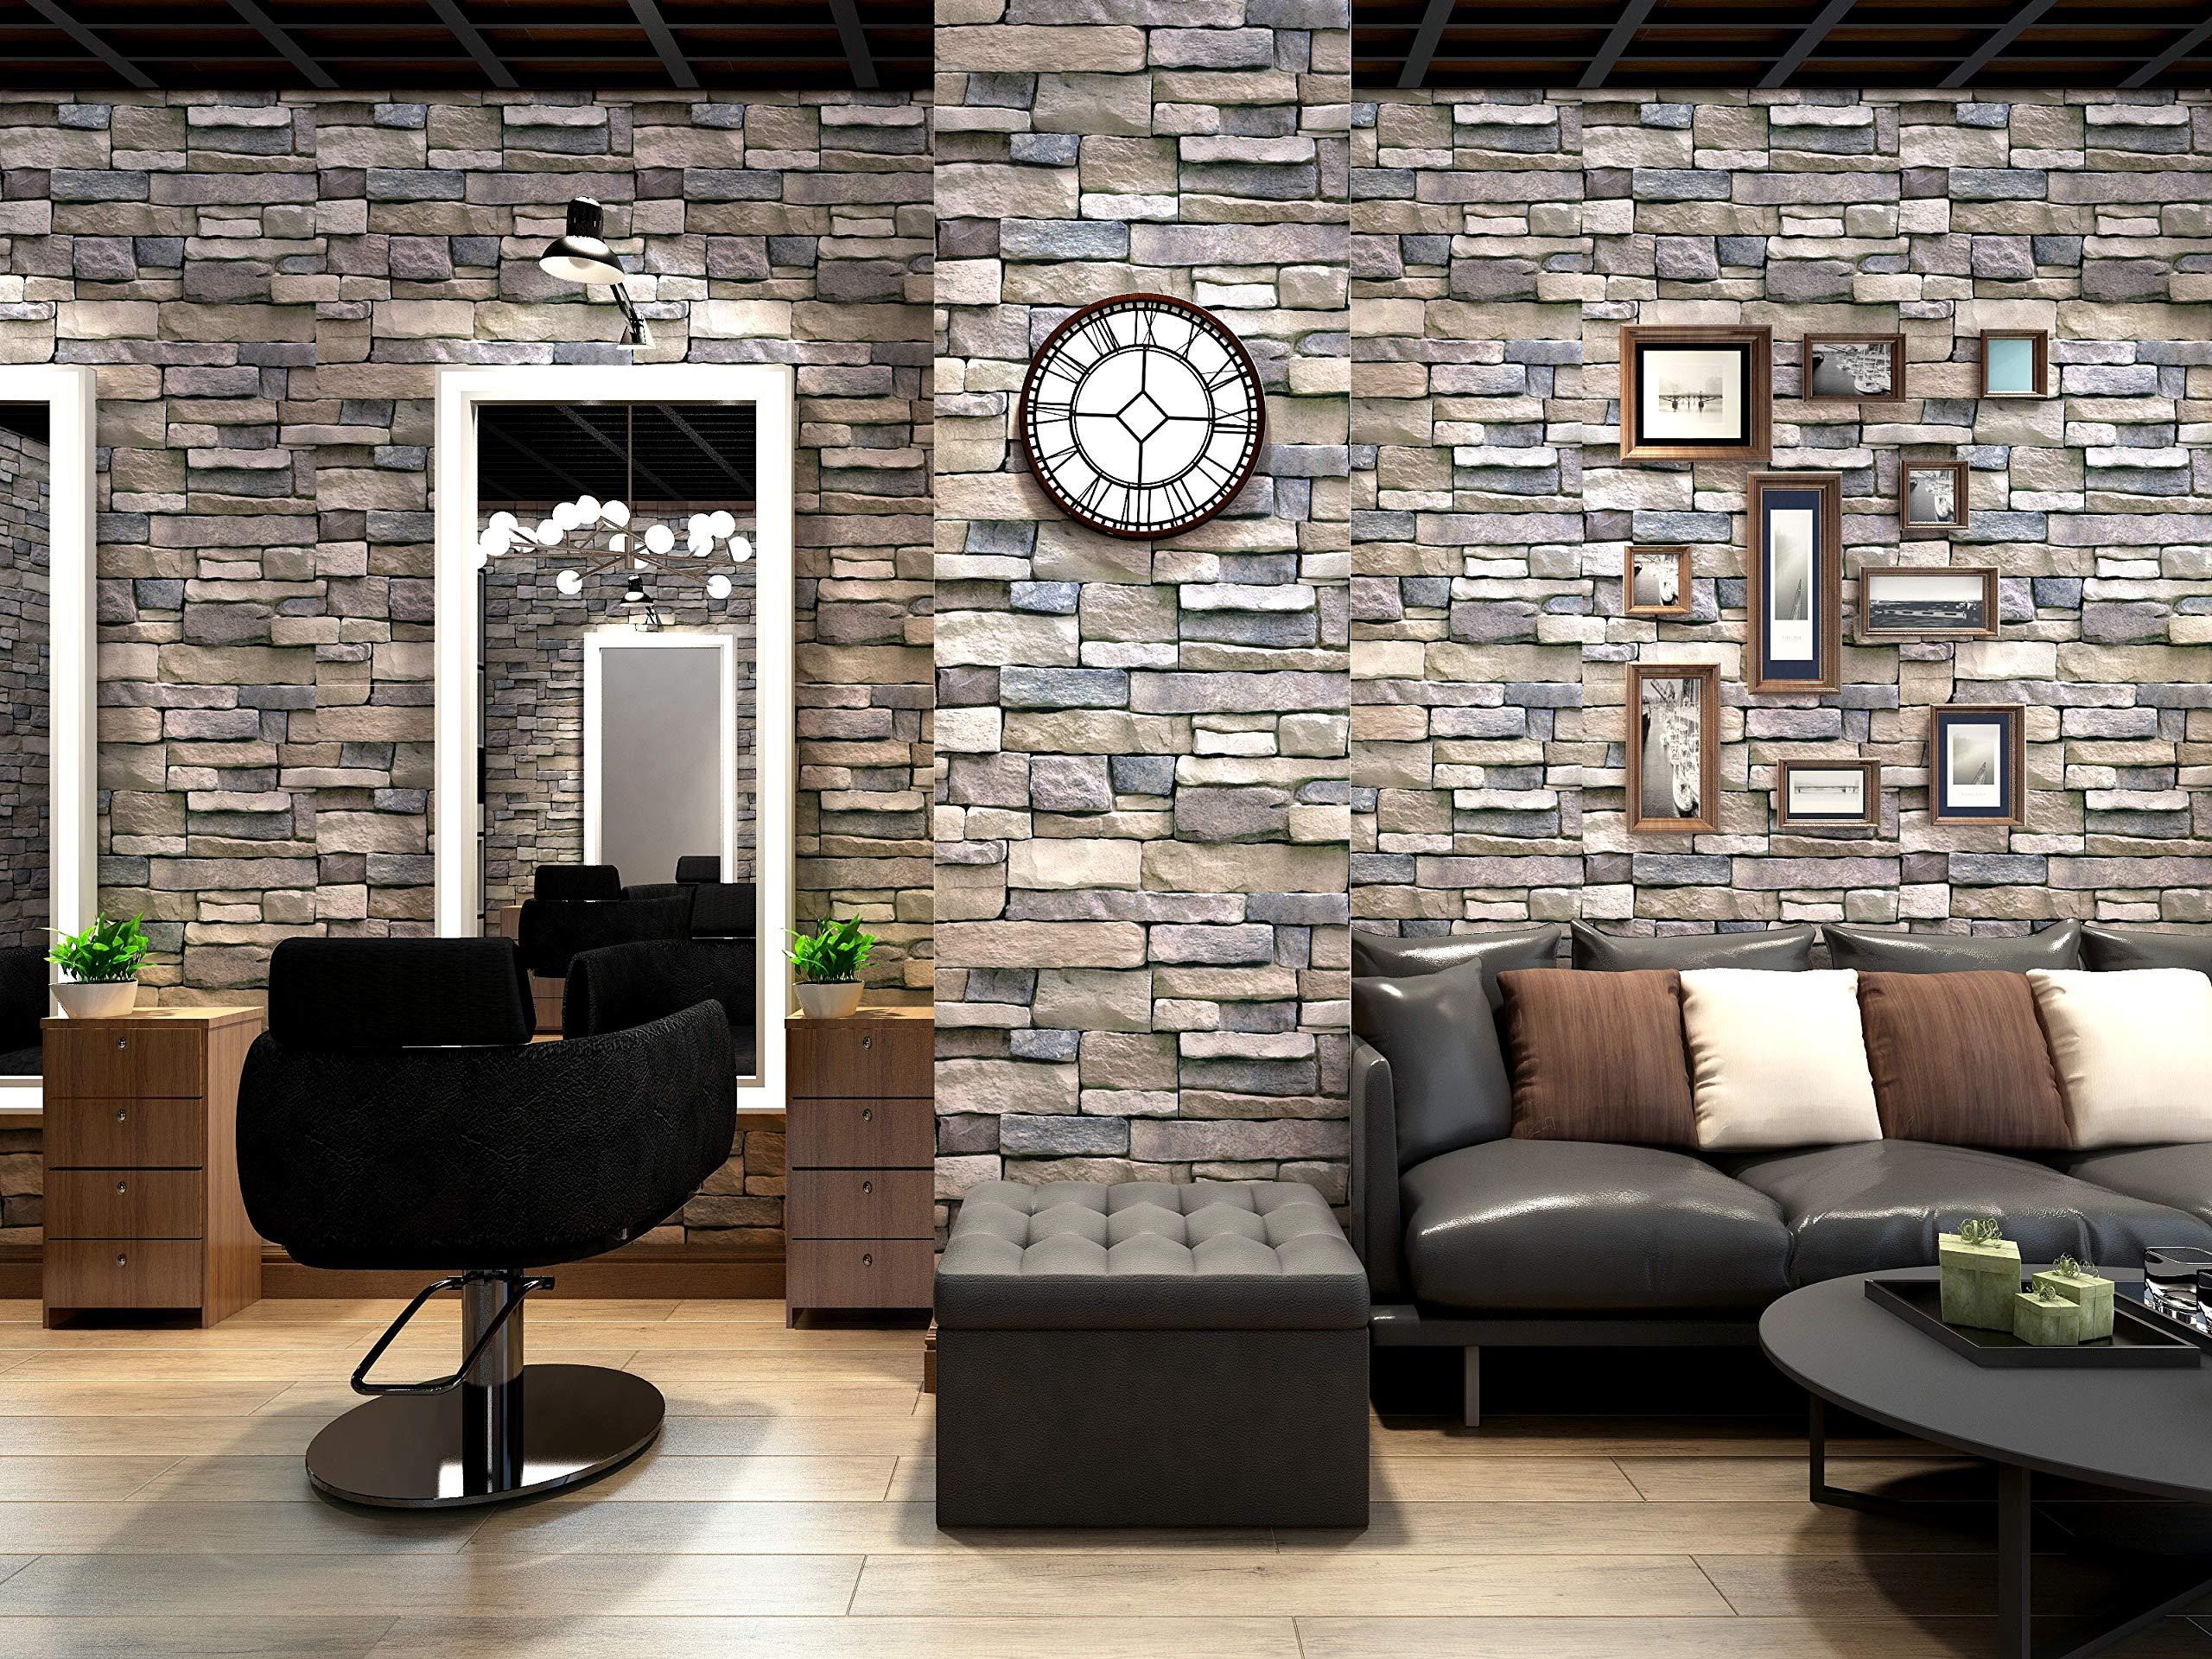 Amazon Homya 壁紙シール 45cmx10m レンガ調シール リメイクシート はがせる壁紙 接着剤不要 Diyシート 防水 防カビ ウォールステッカー 壁紙